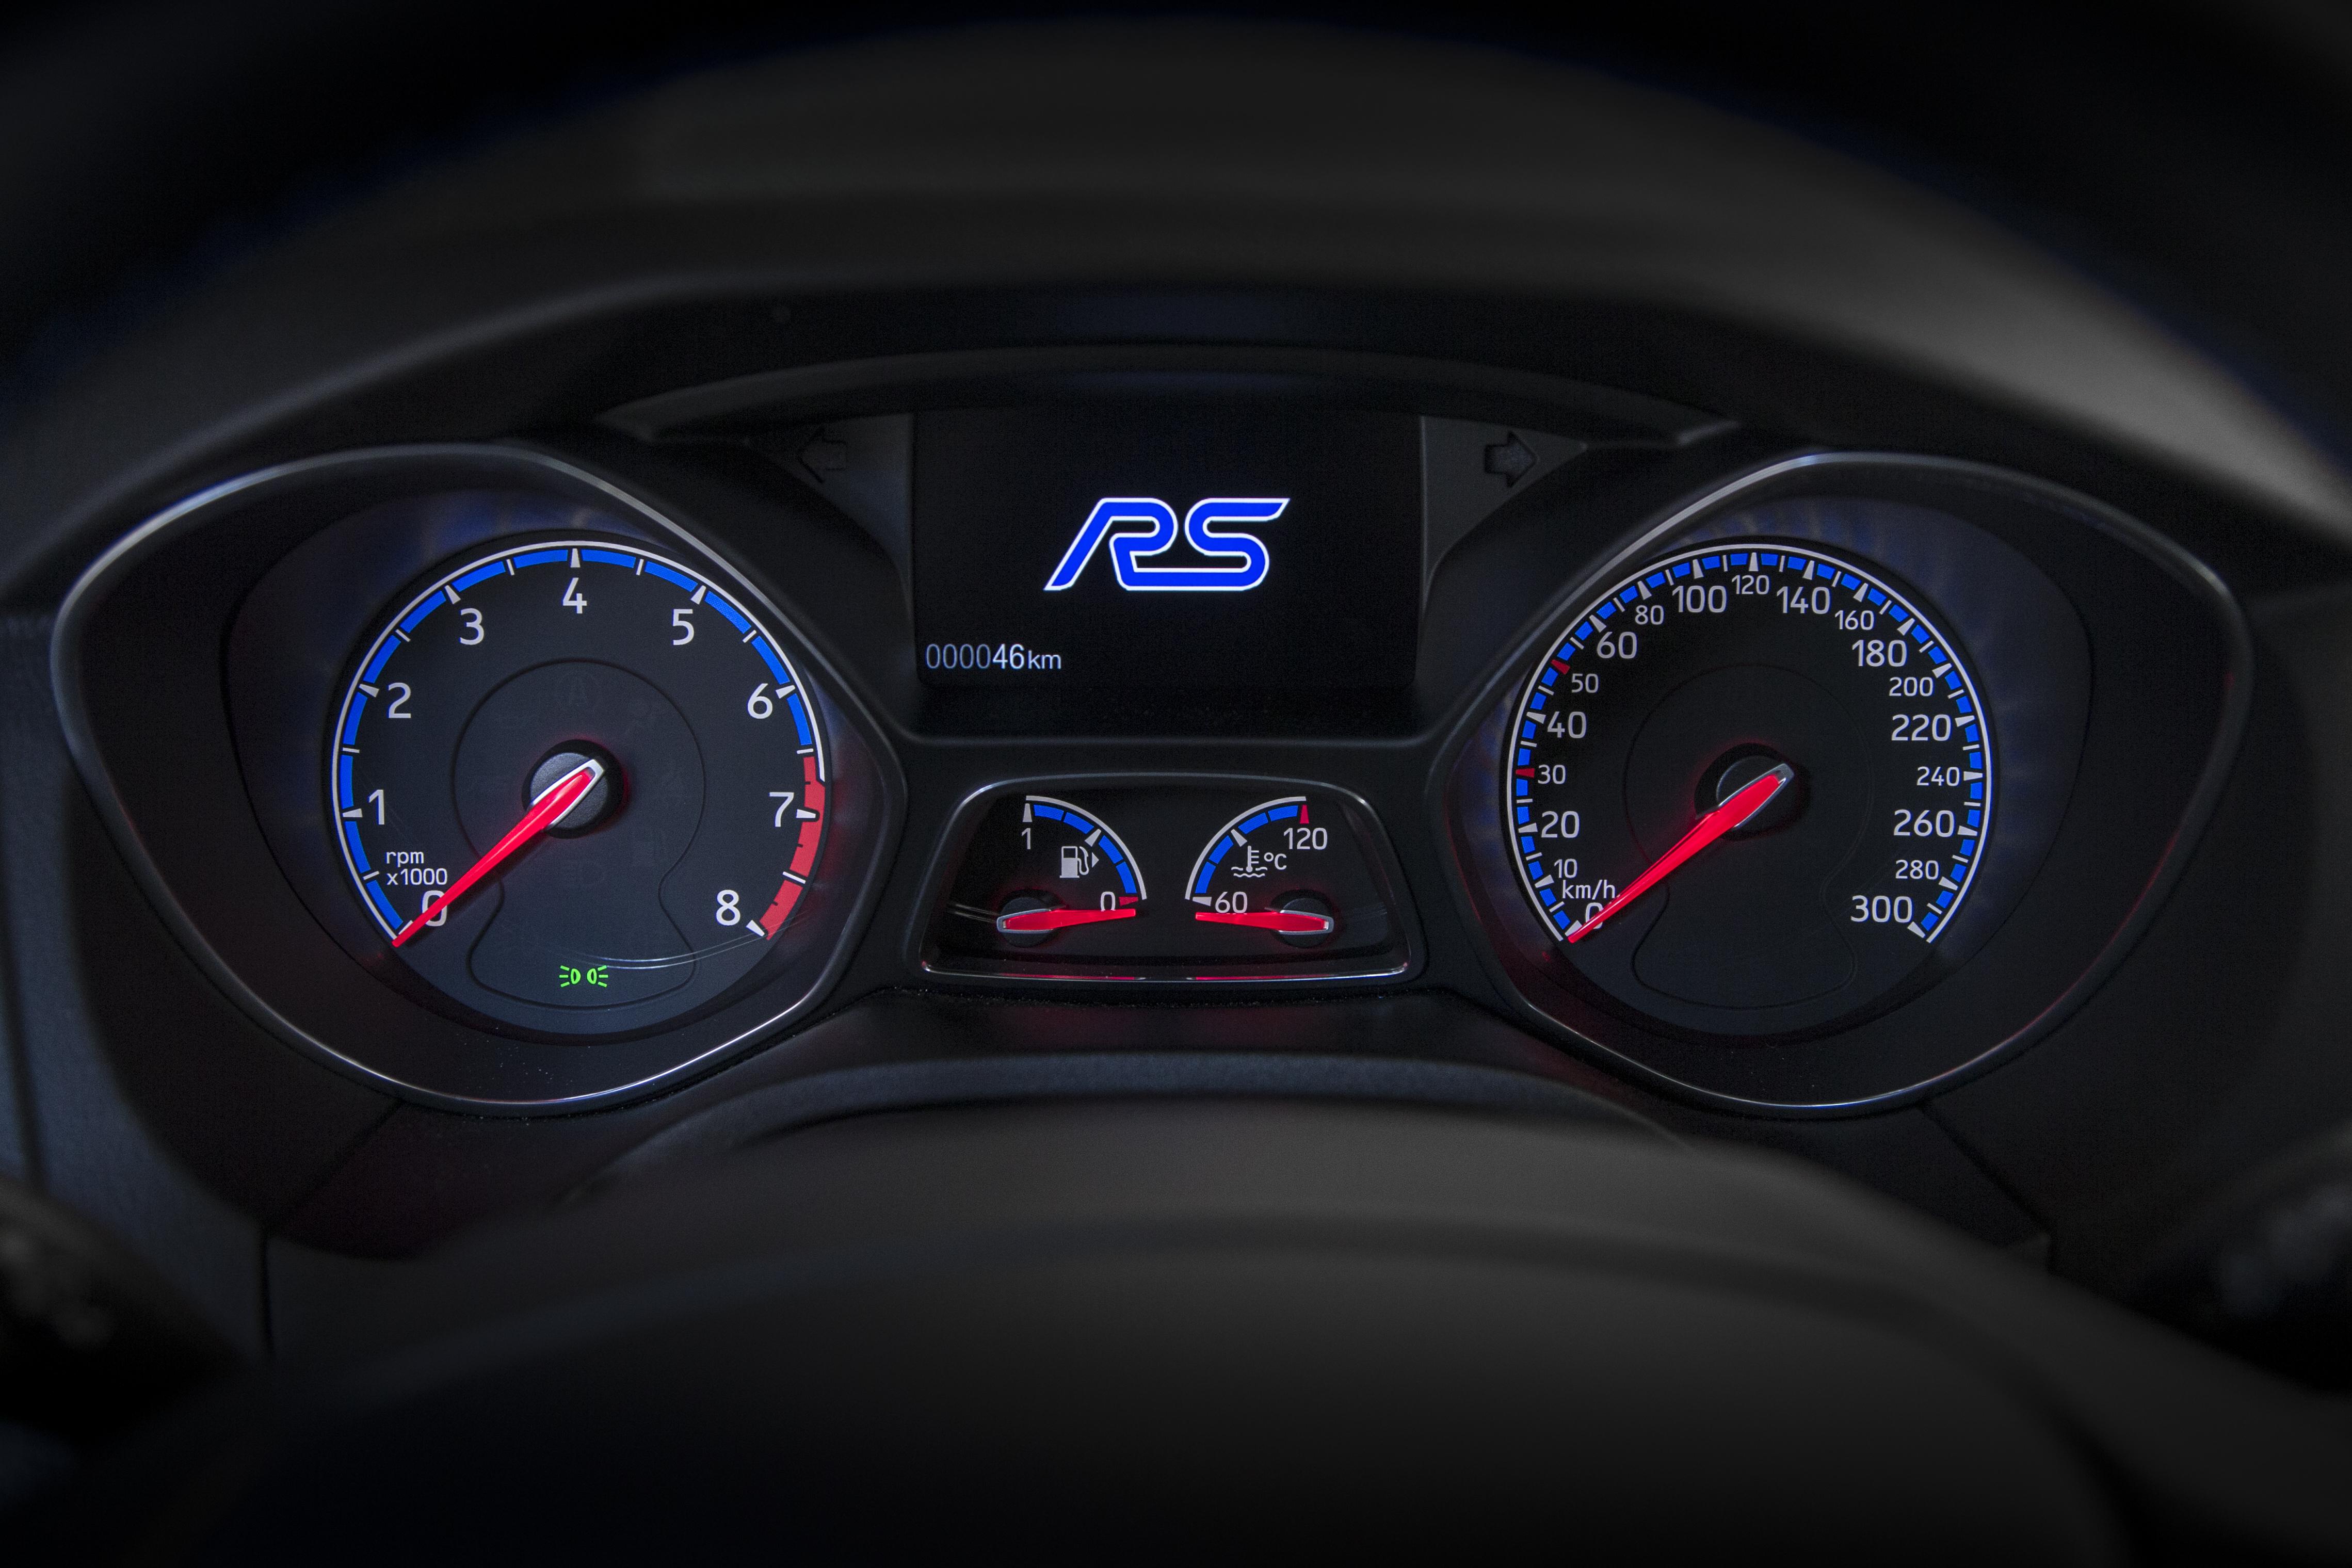 La nuova Ford Focus RS